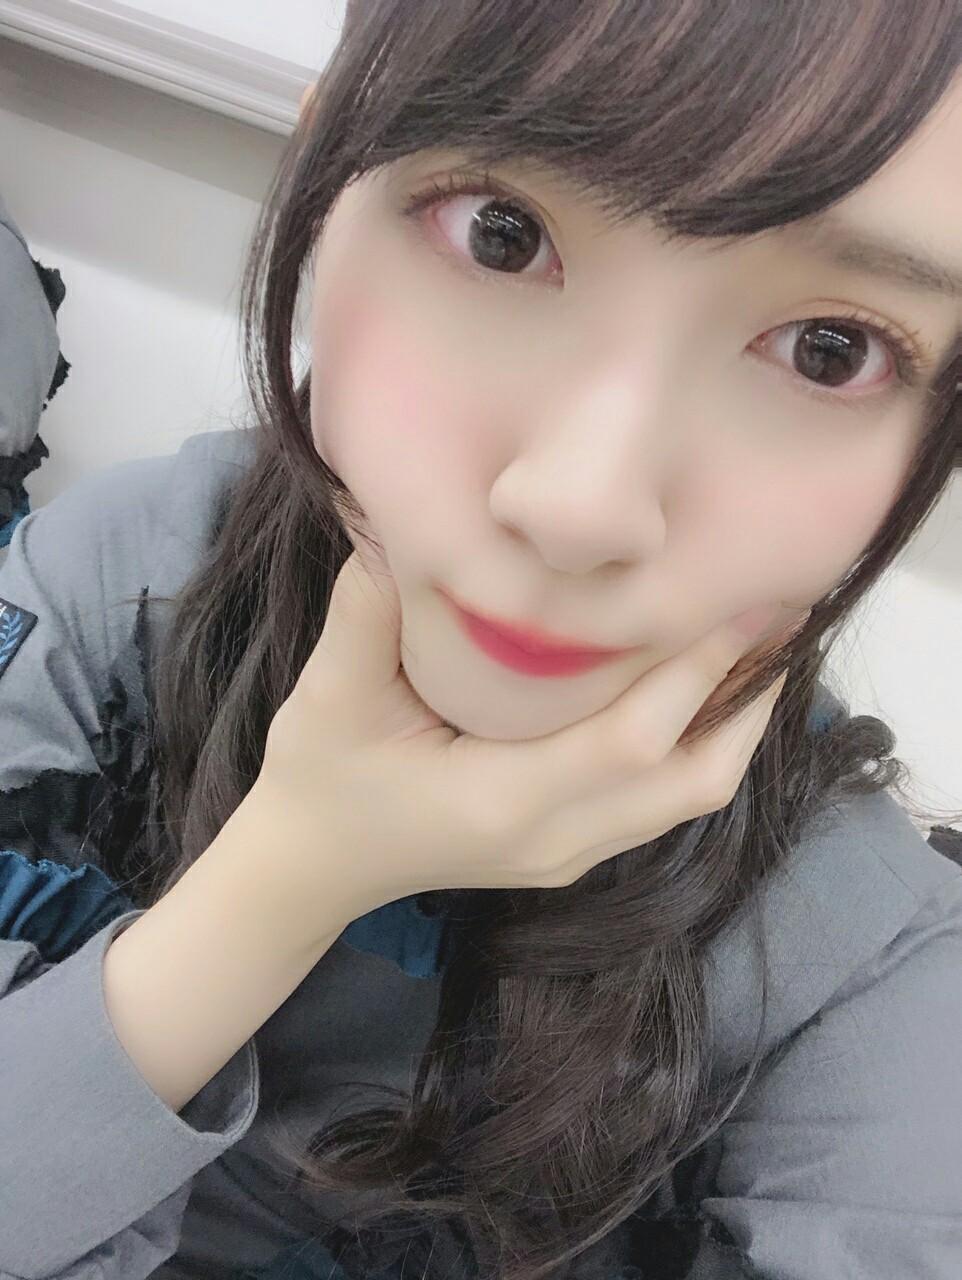 f:id:asitaha46:20181207012452j:image